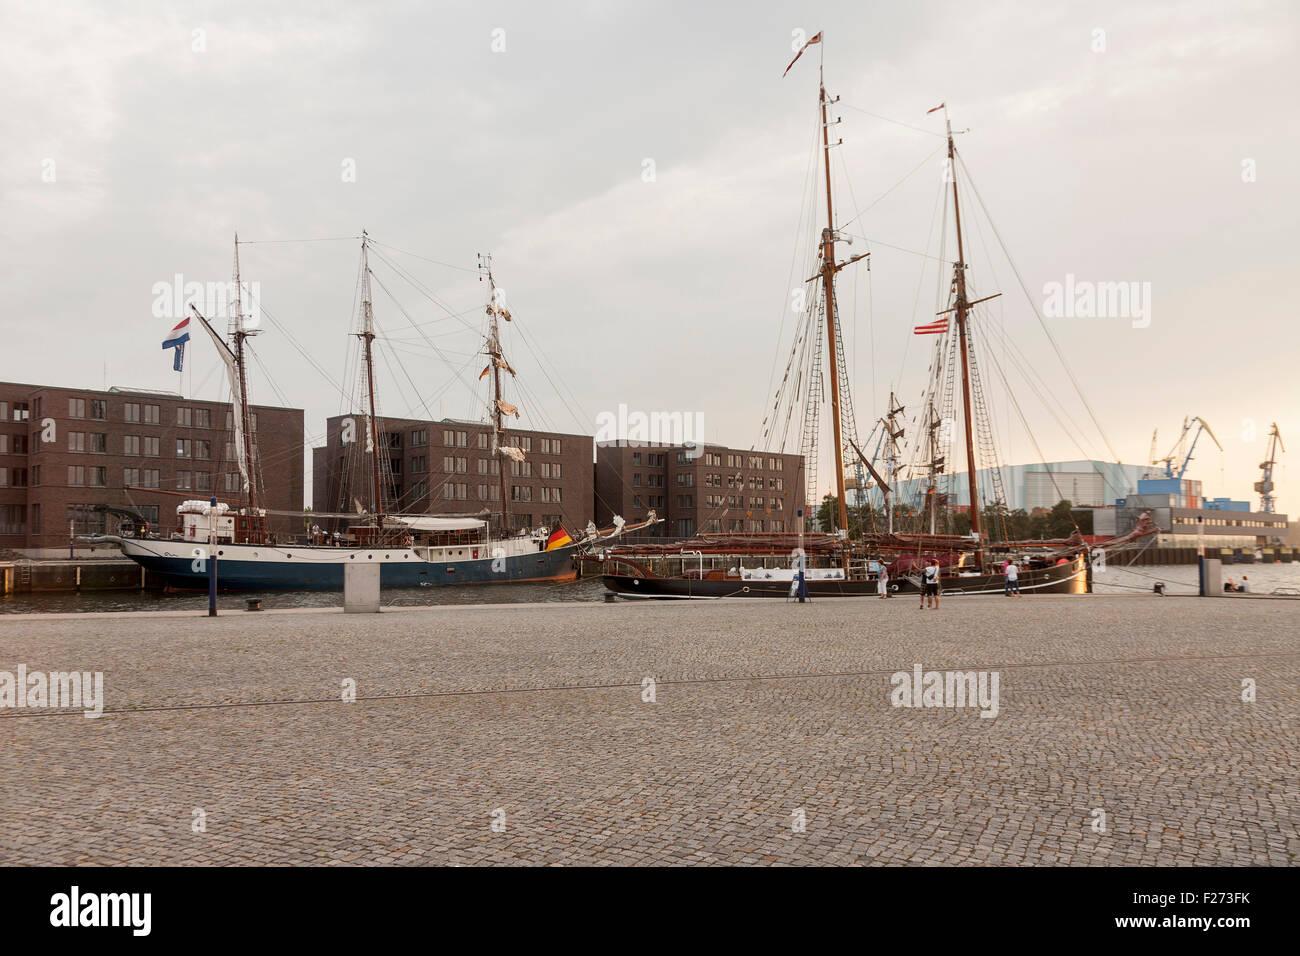 Sailboats moored at a harbour, Wismar, Mecklenburg-Vorpommern, Germany - Stock Image